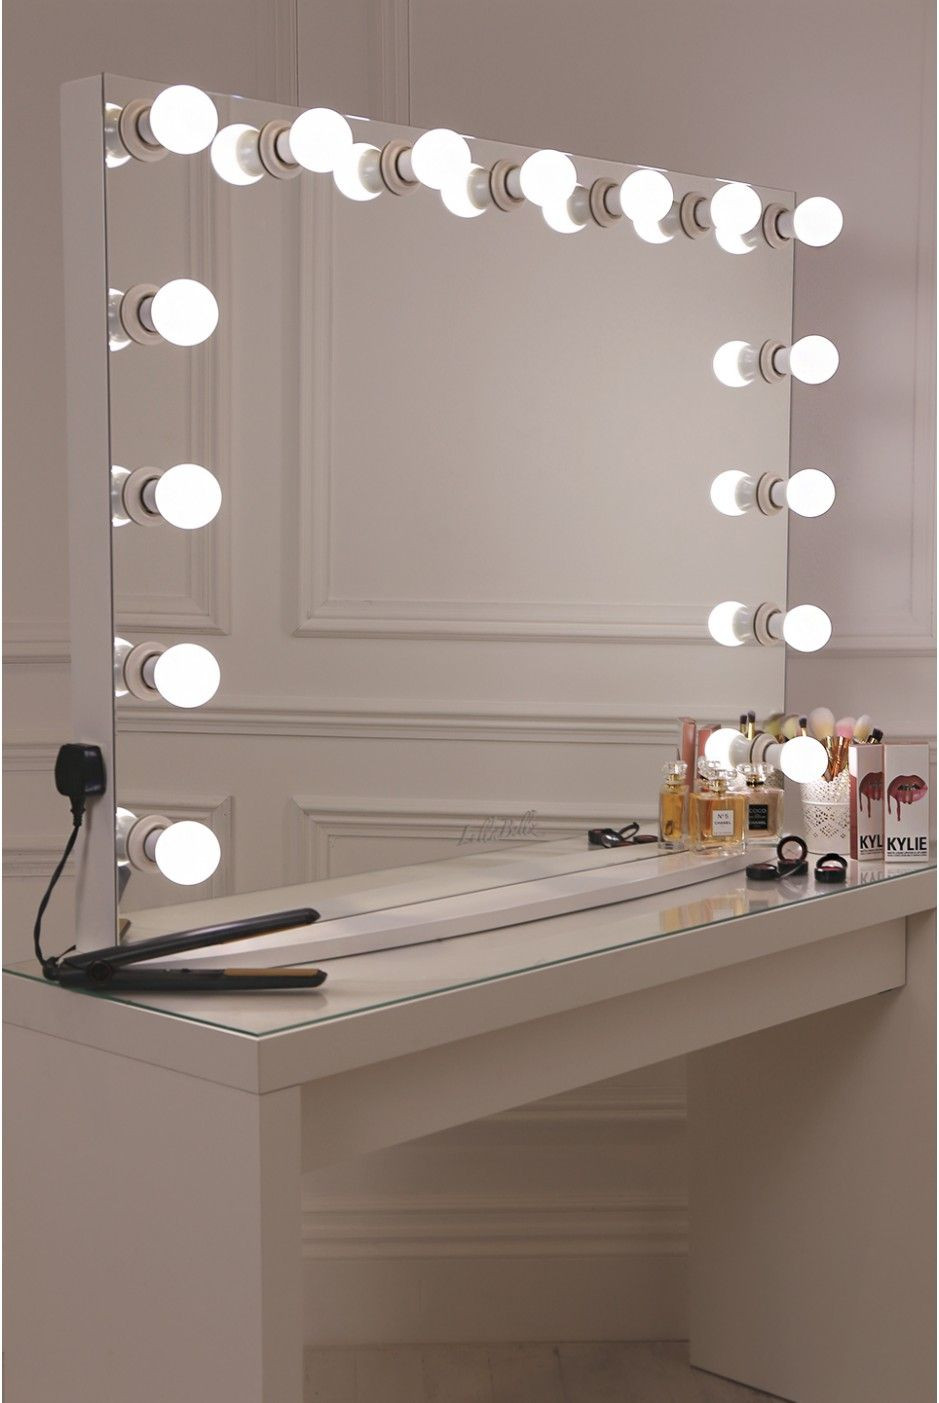 DIY Vanity Lights  DIY Vanity Mirror With Lights for Bathroom and Makeup